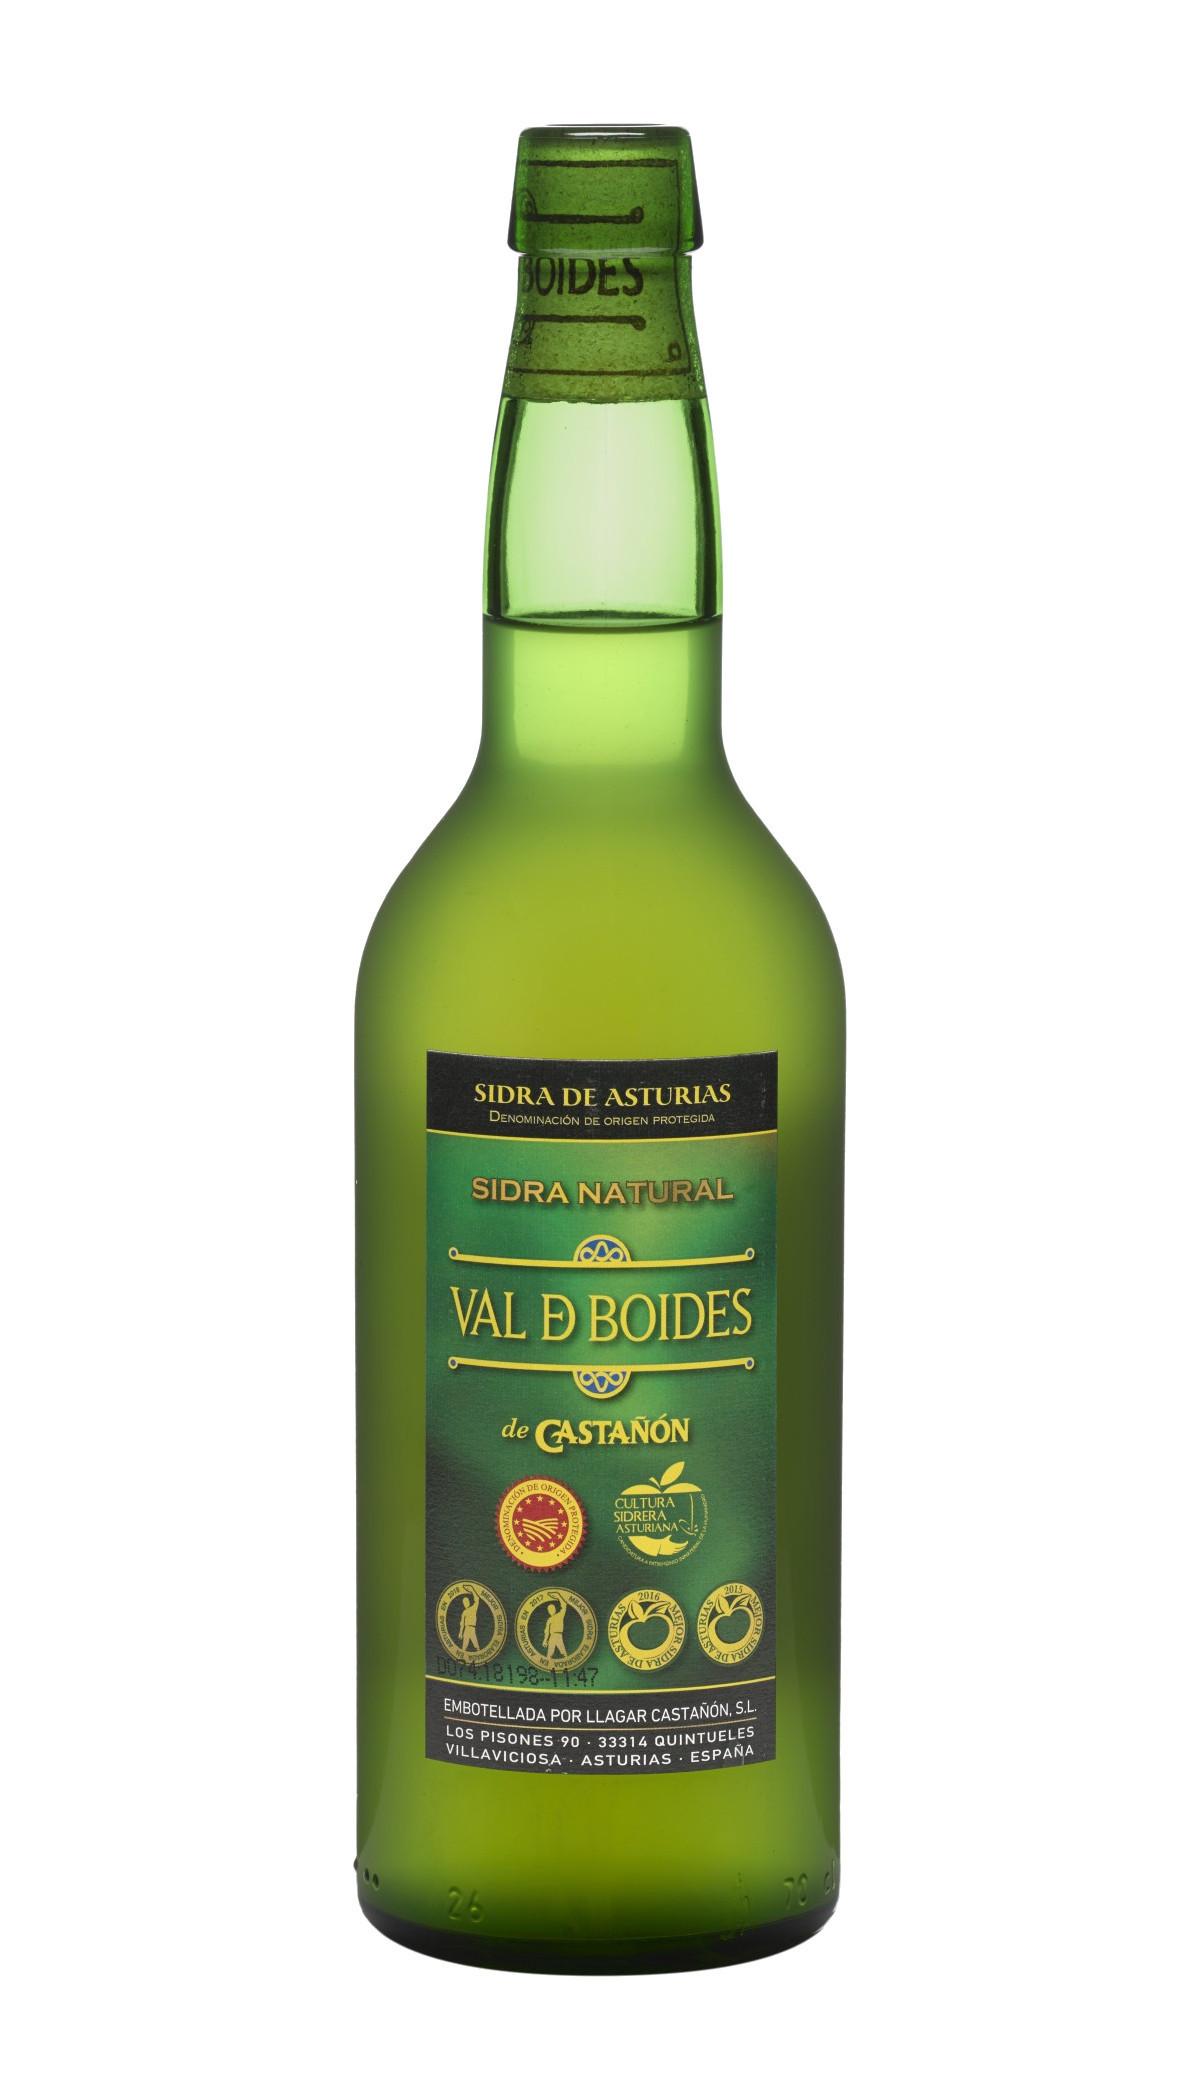 Botella de Sidra Natural Val de Boides